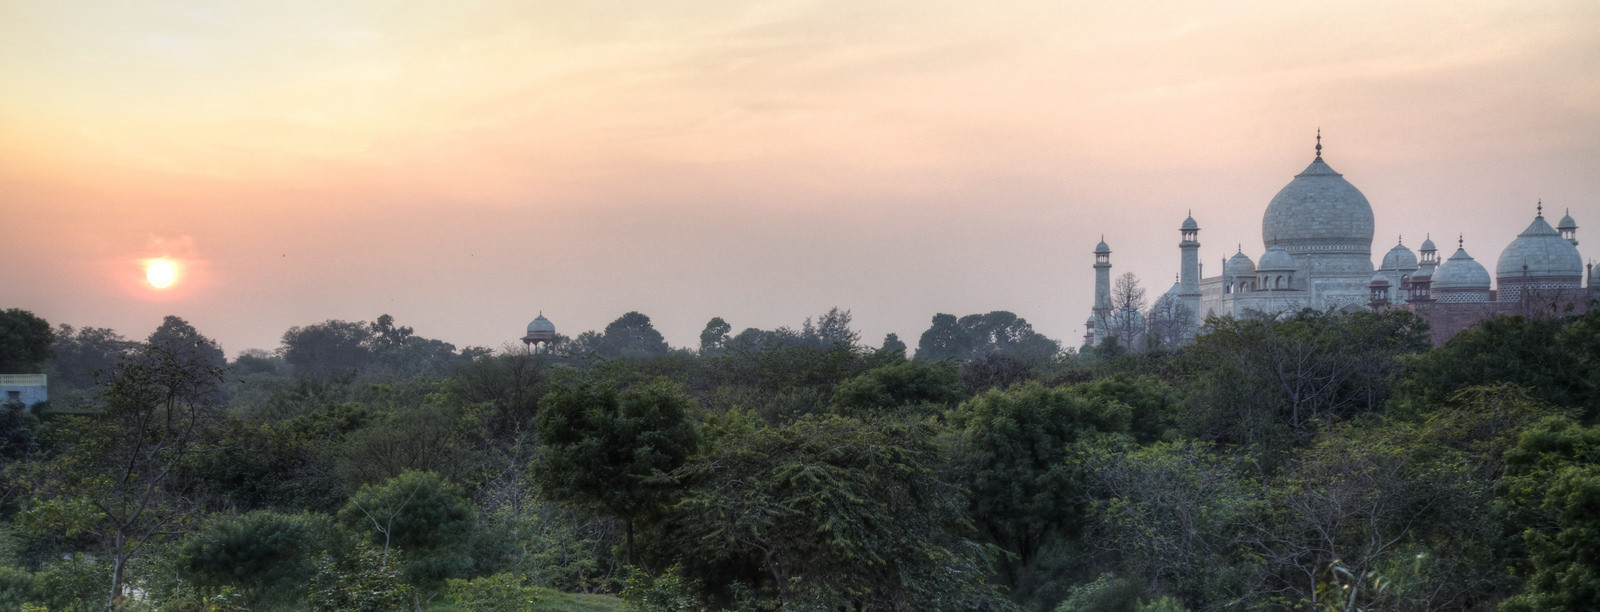 Taj Mahal at sunset*